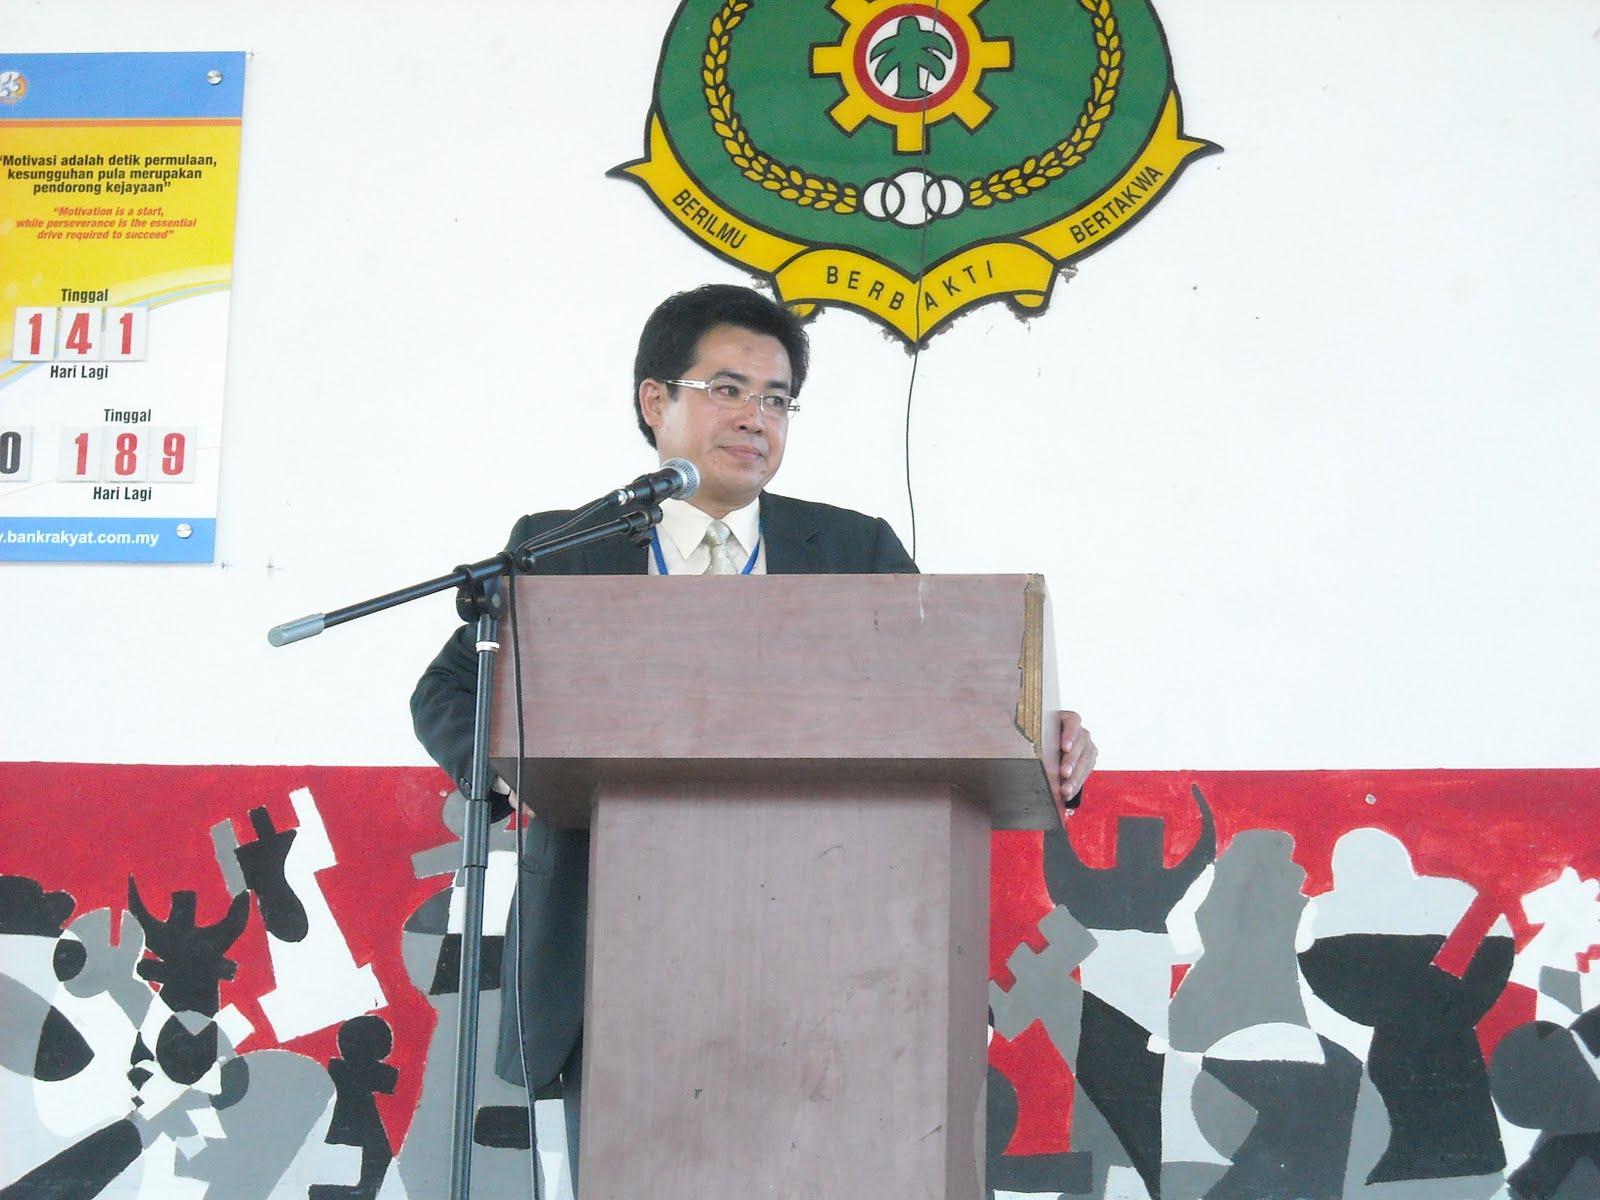 Ucapan dan Bacaan Perutusan Menteri Pelajaran, KPM dan Pengarah